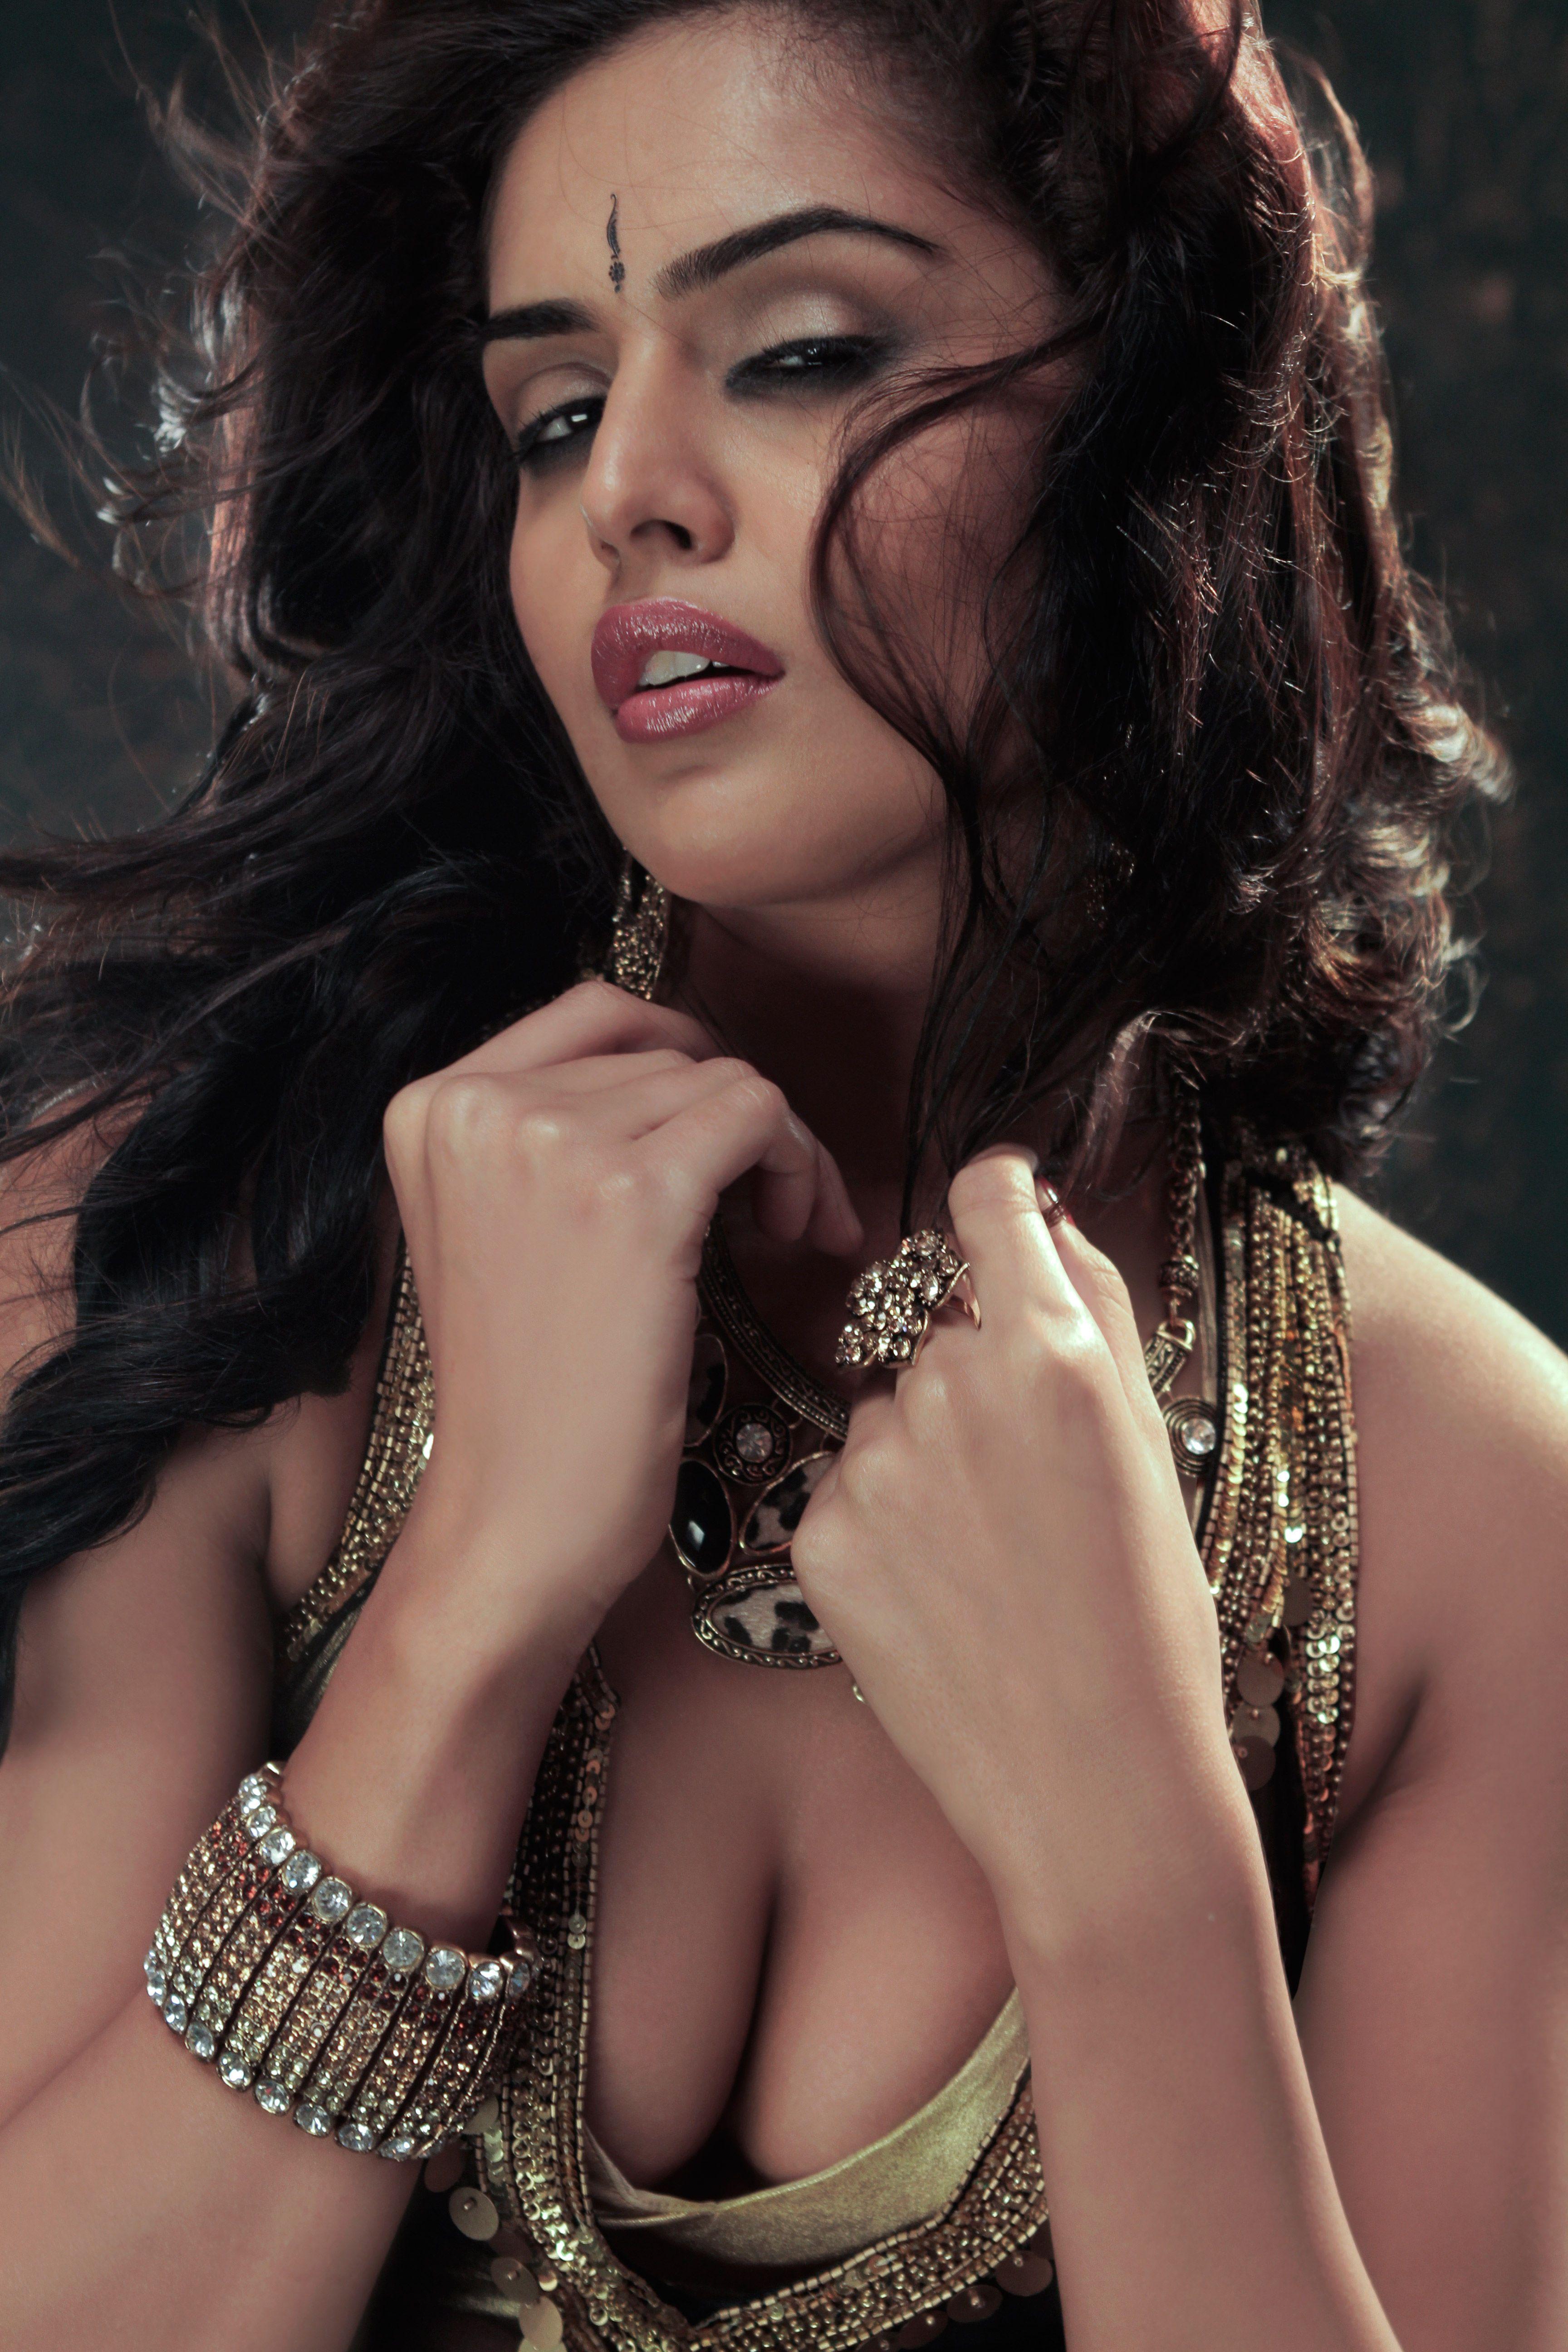 Paparazzi Nathalia Kaur naked (91 photo), Tits, Hot, Instagram, butt 2015